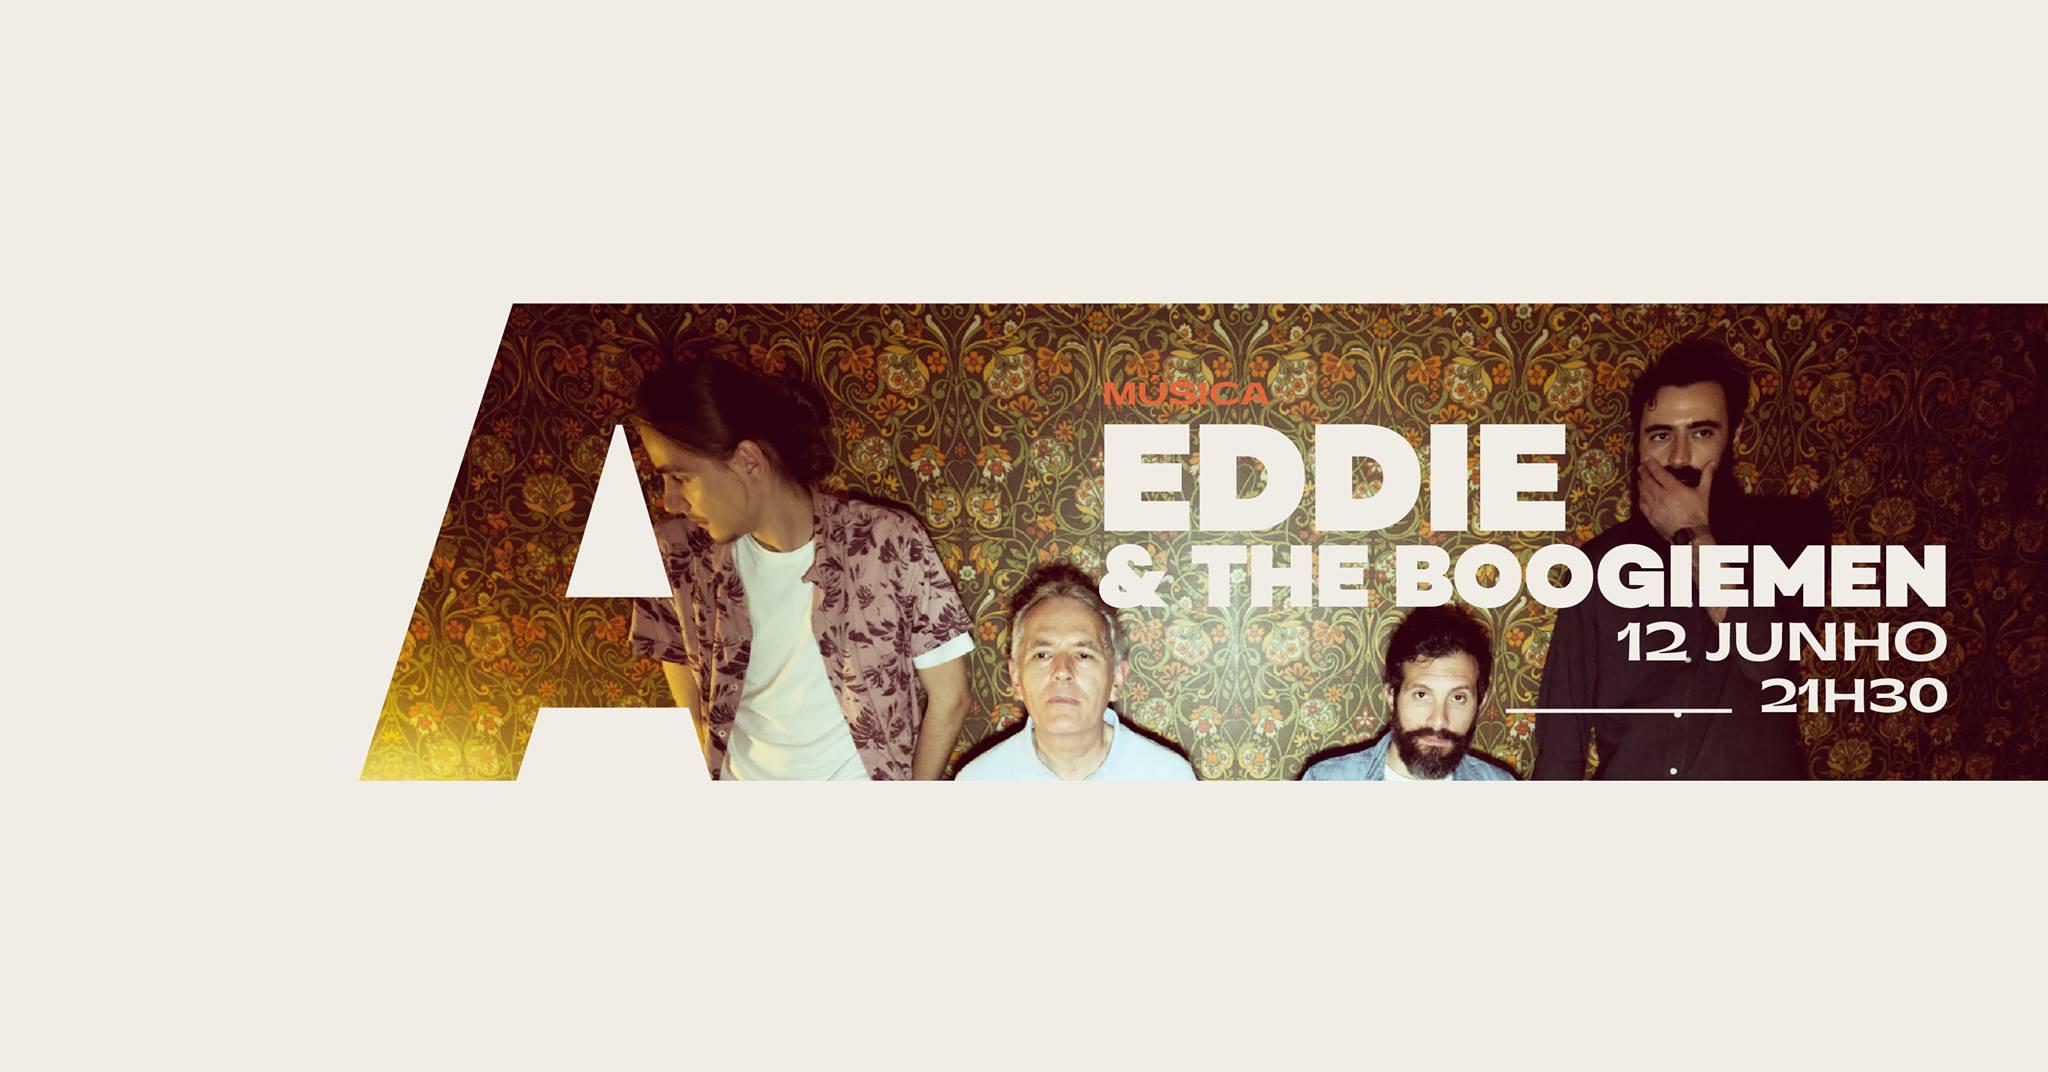 Eddie & The Boogiemen @Avenida Café-Concerto